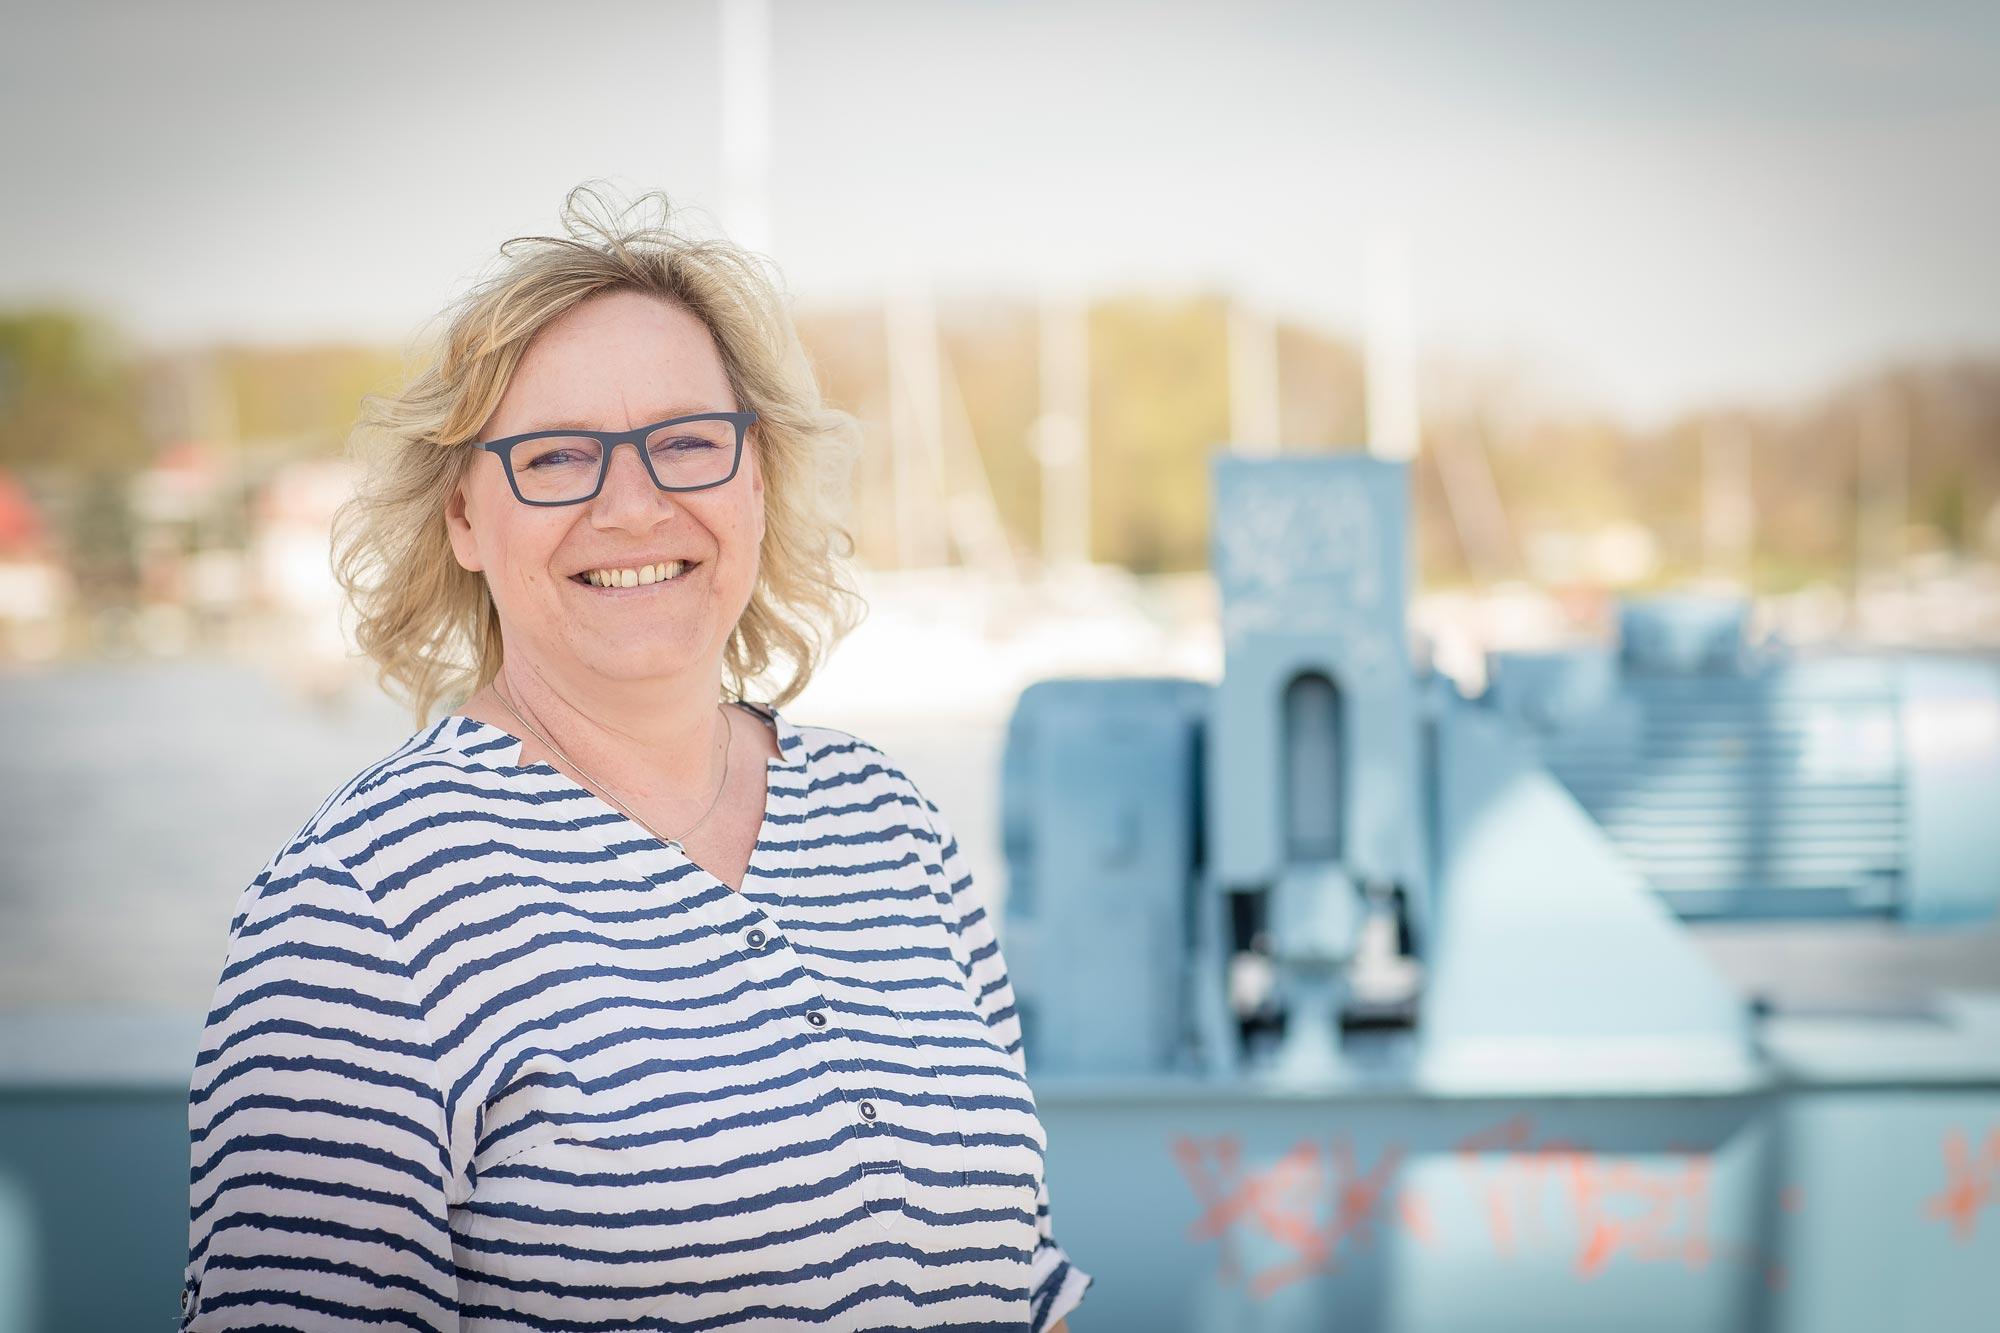 Katrin Bartusek ist Augenoptikerin bei Optik Sagawe in Reutershagen